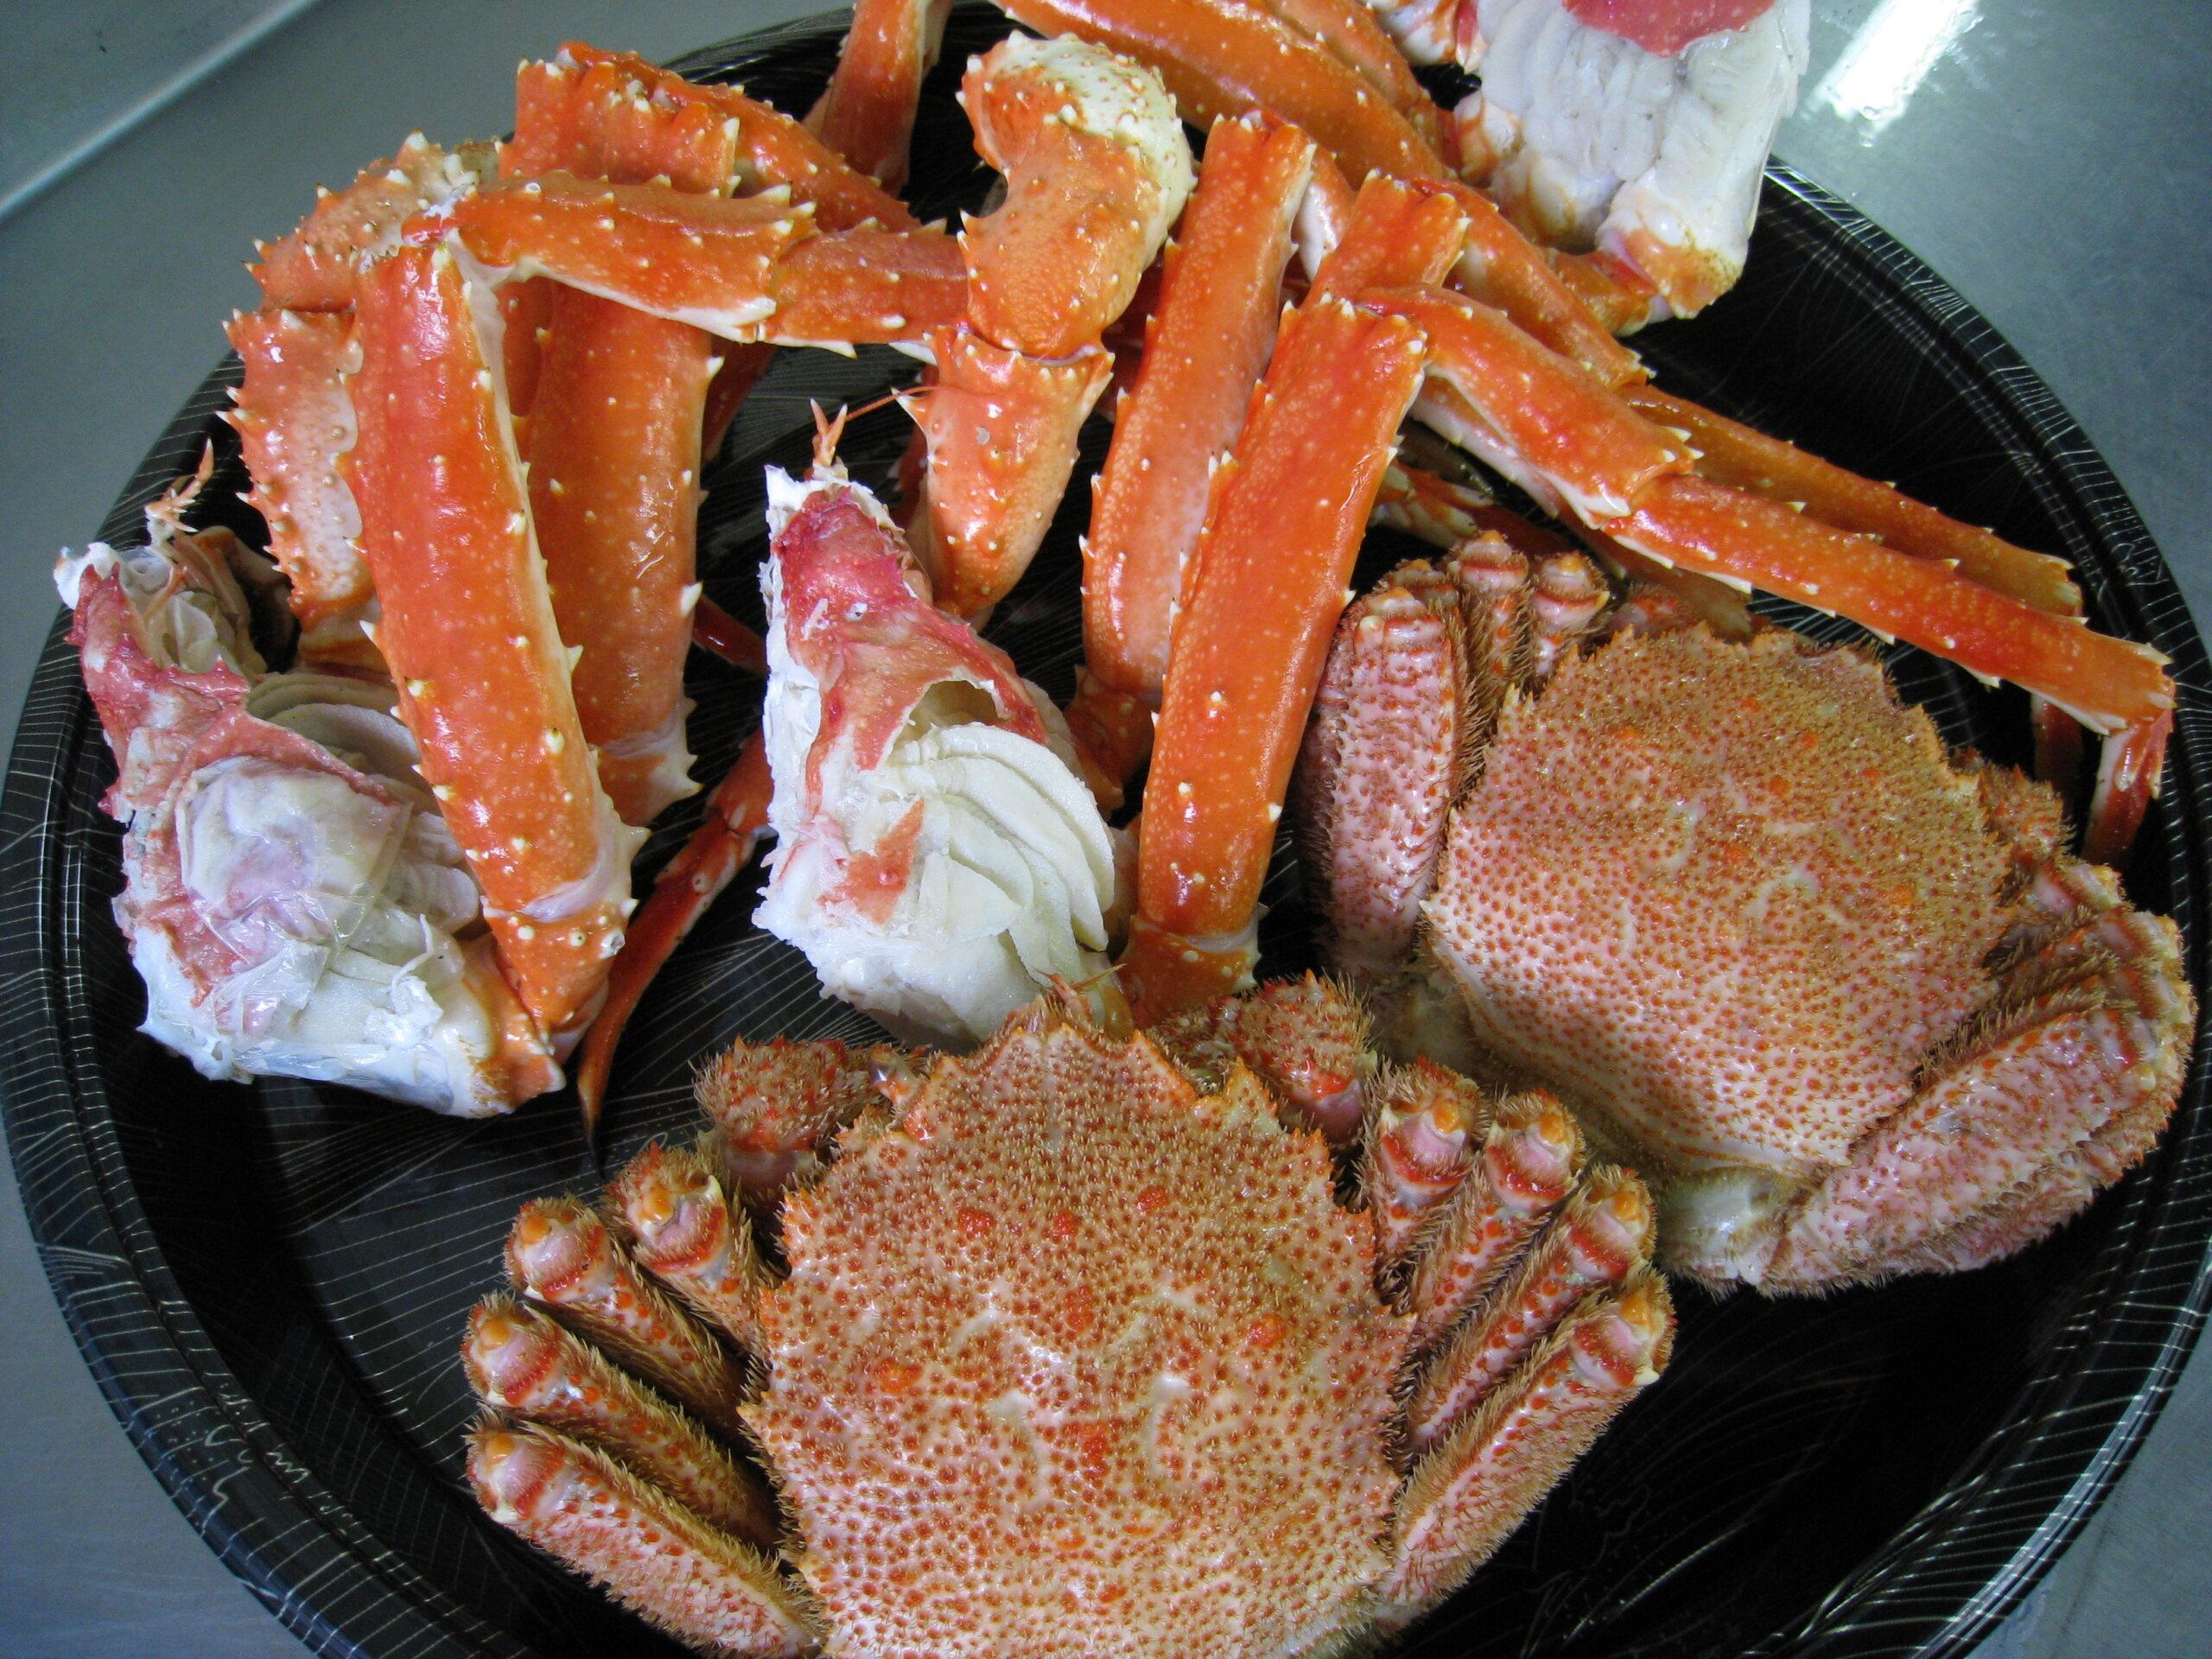 Kanekatsu Watanabe Suisan: Making Fresh Crab a Family Business